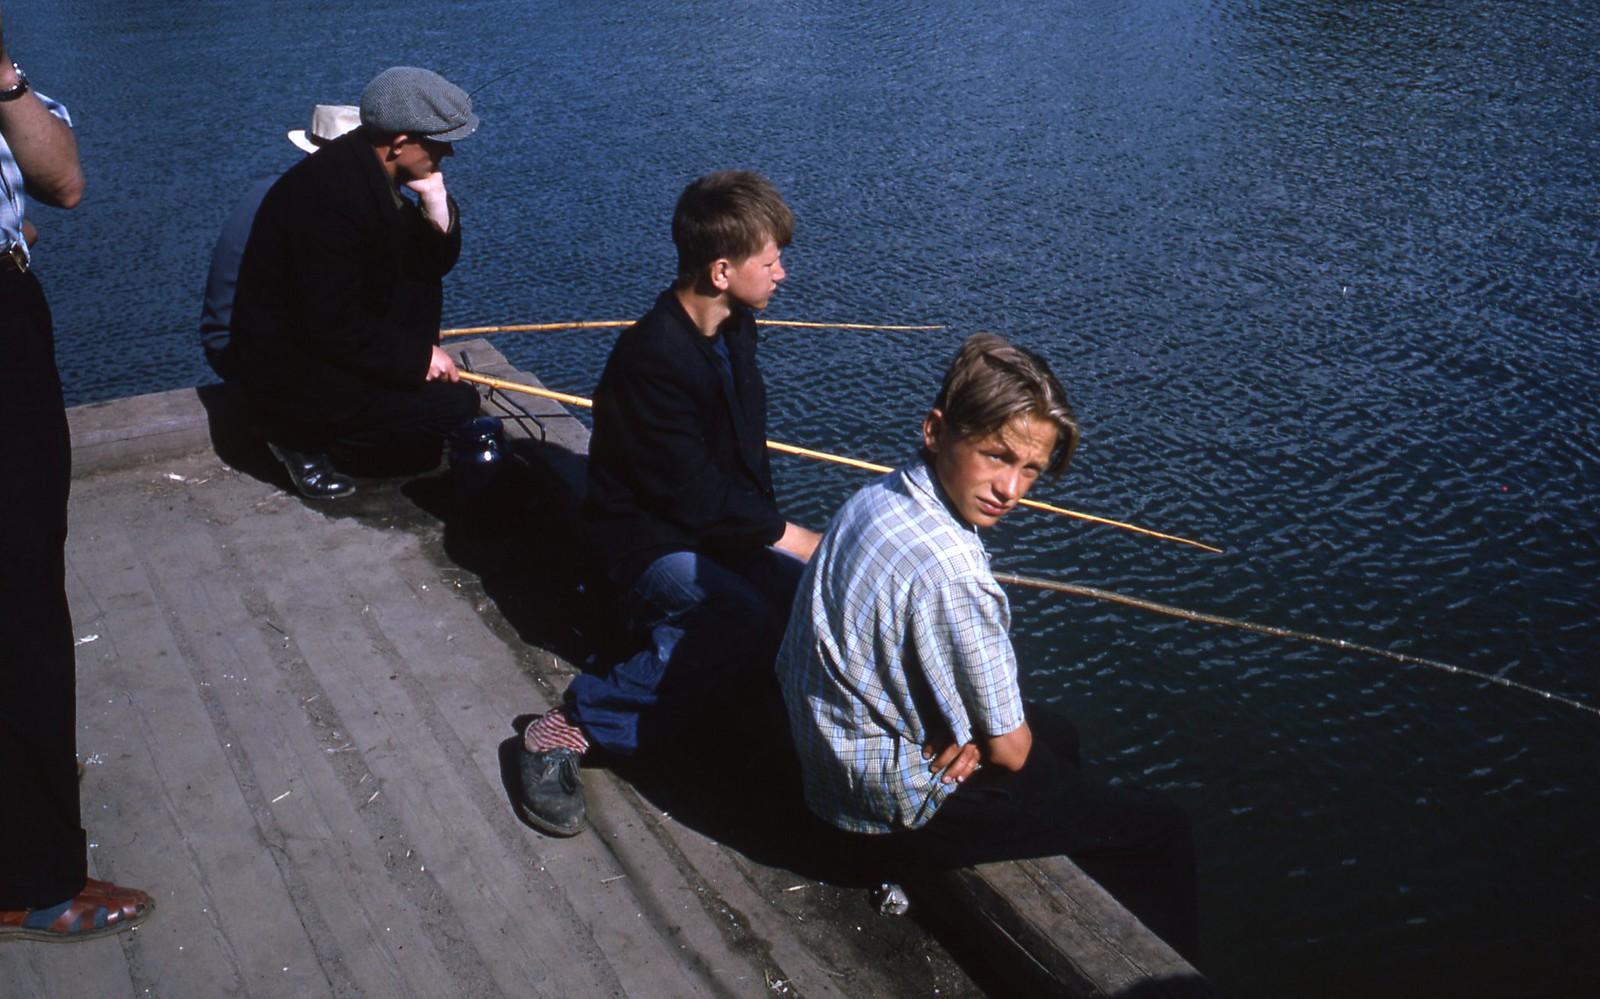 hammond-MA10-Ostankino-people-sunbathing-and-fishing-022